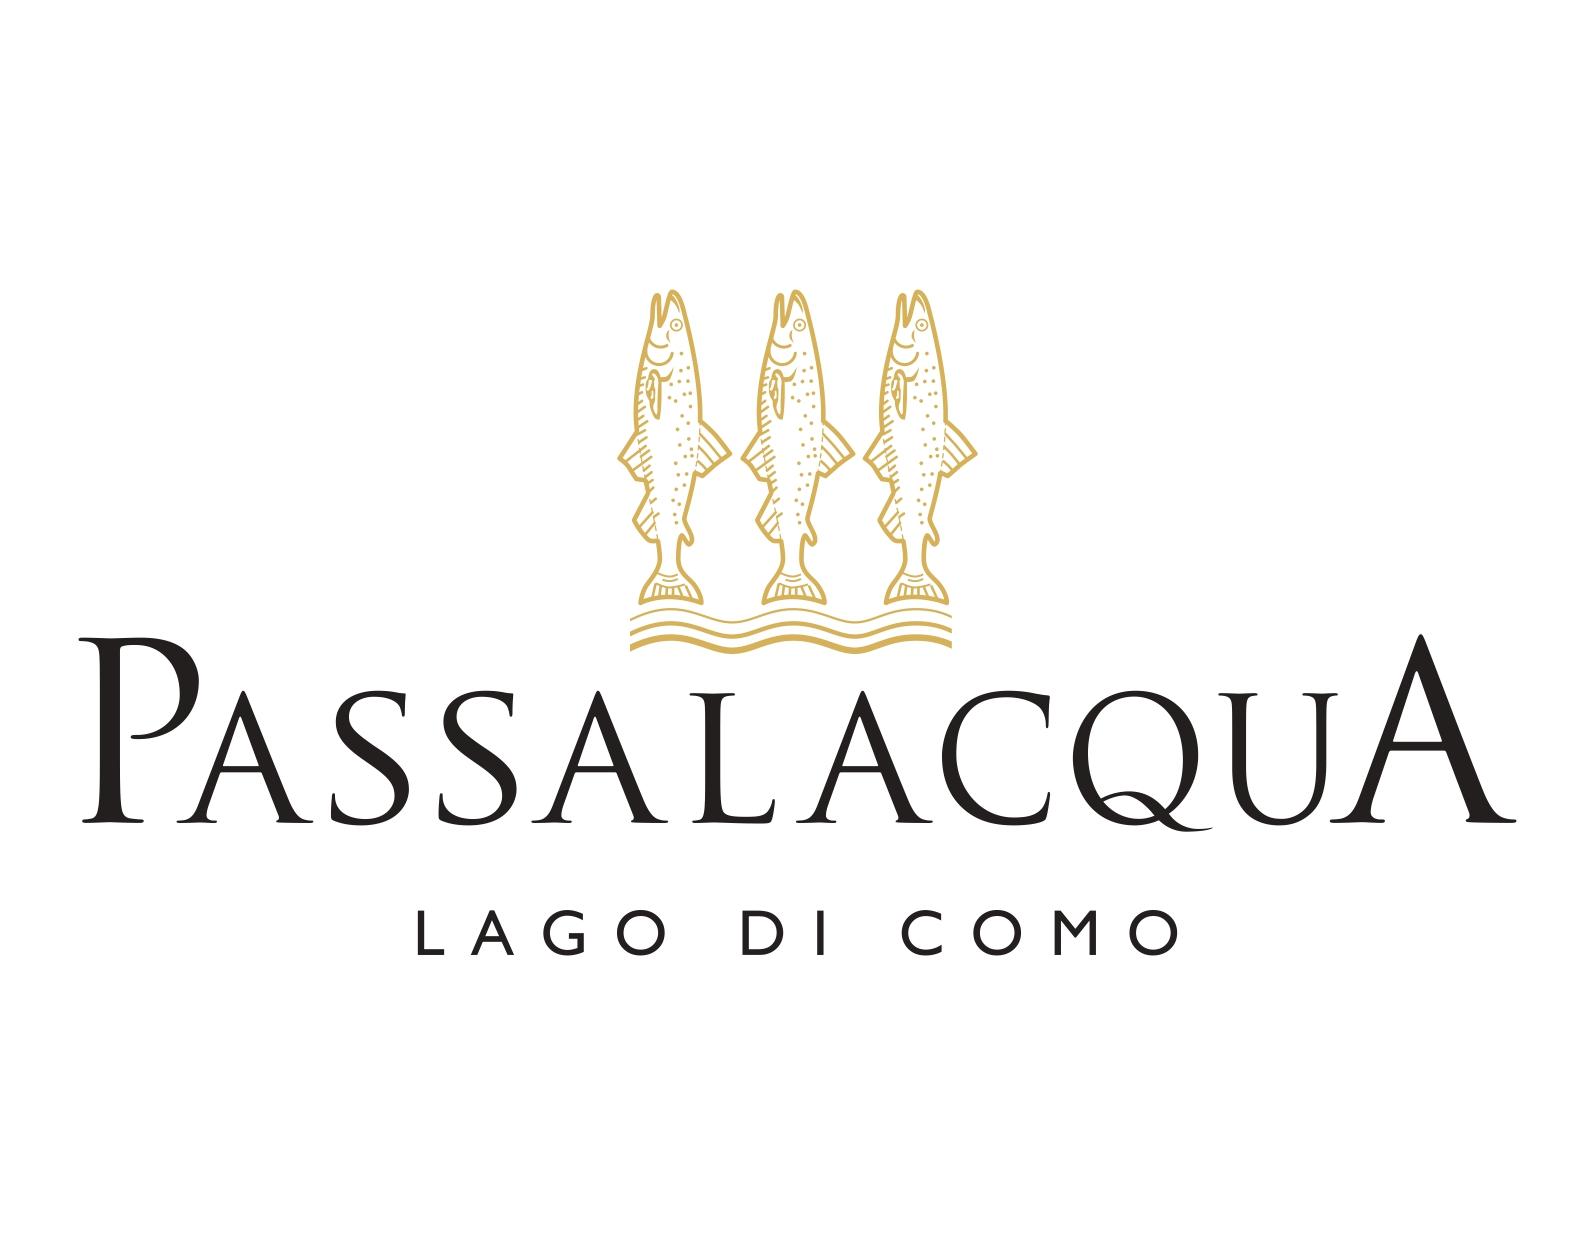 Passalacqua_